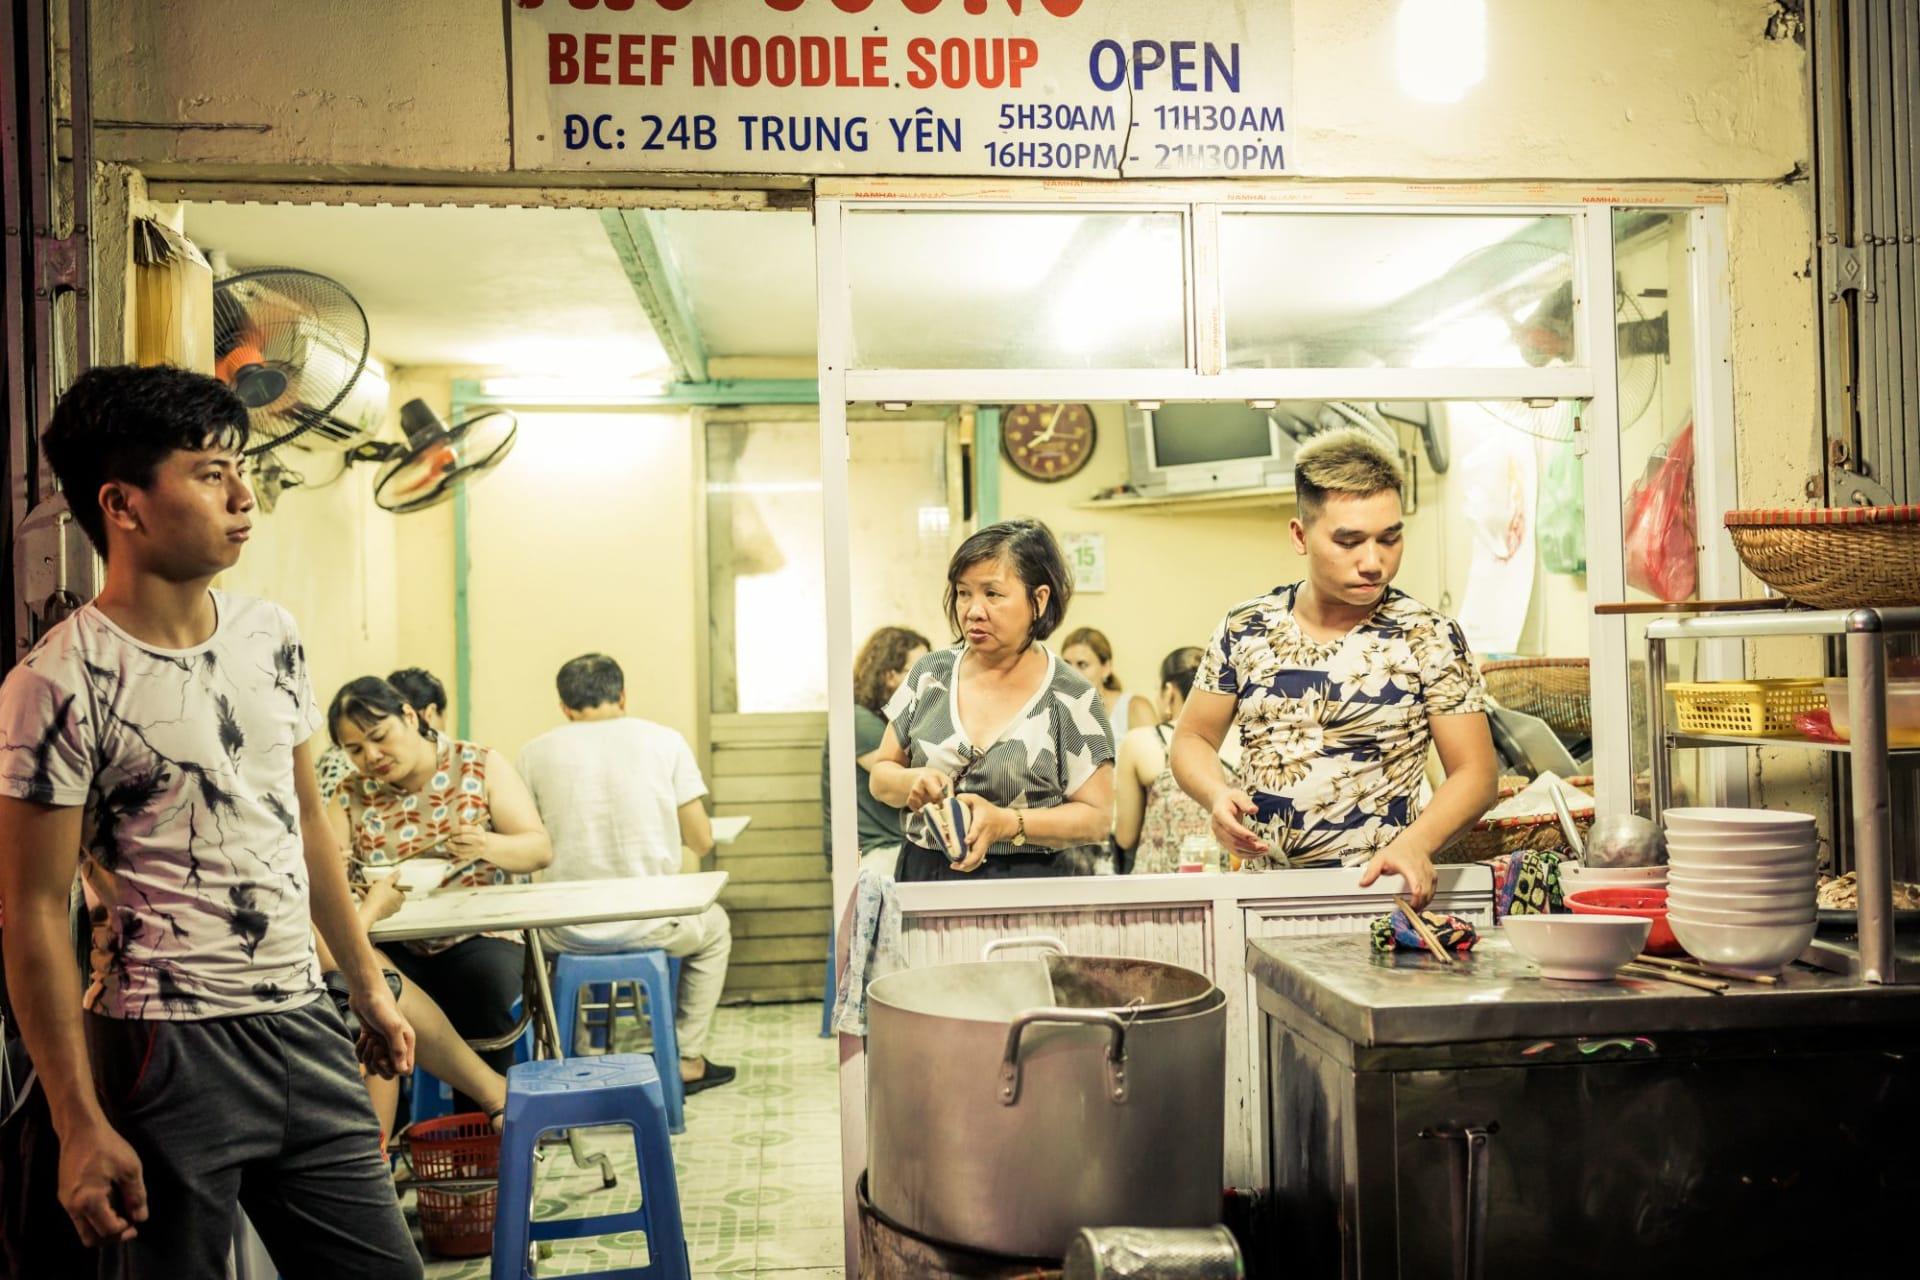 Hanoi Food Stall